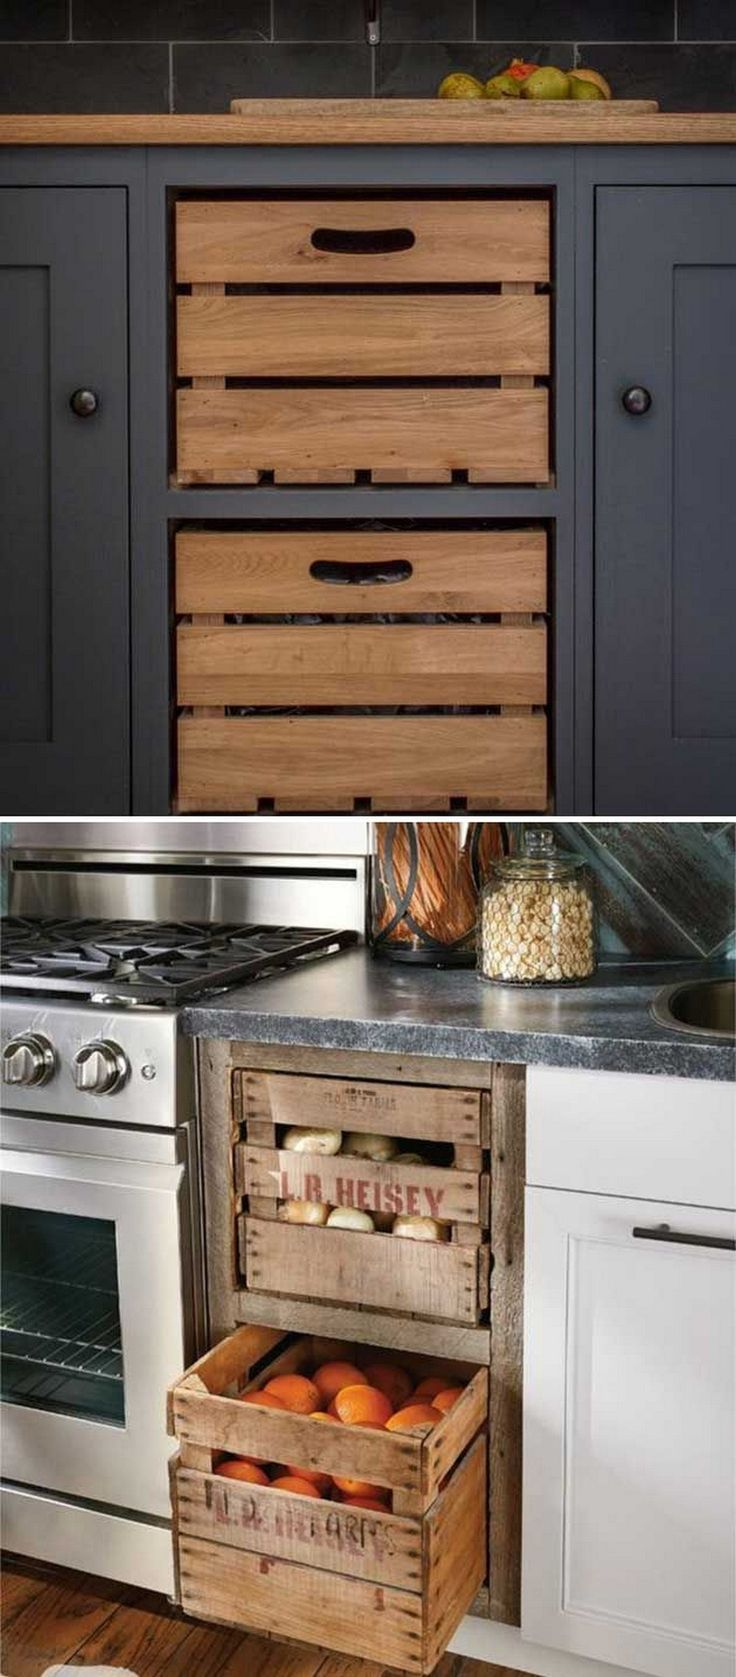 Farmhouse Kitchen Ideas On A Budget For 2017 10 Kitchen Decor Kitchen Remodel Rustic Kitchen